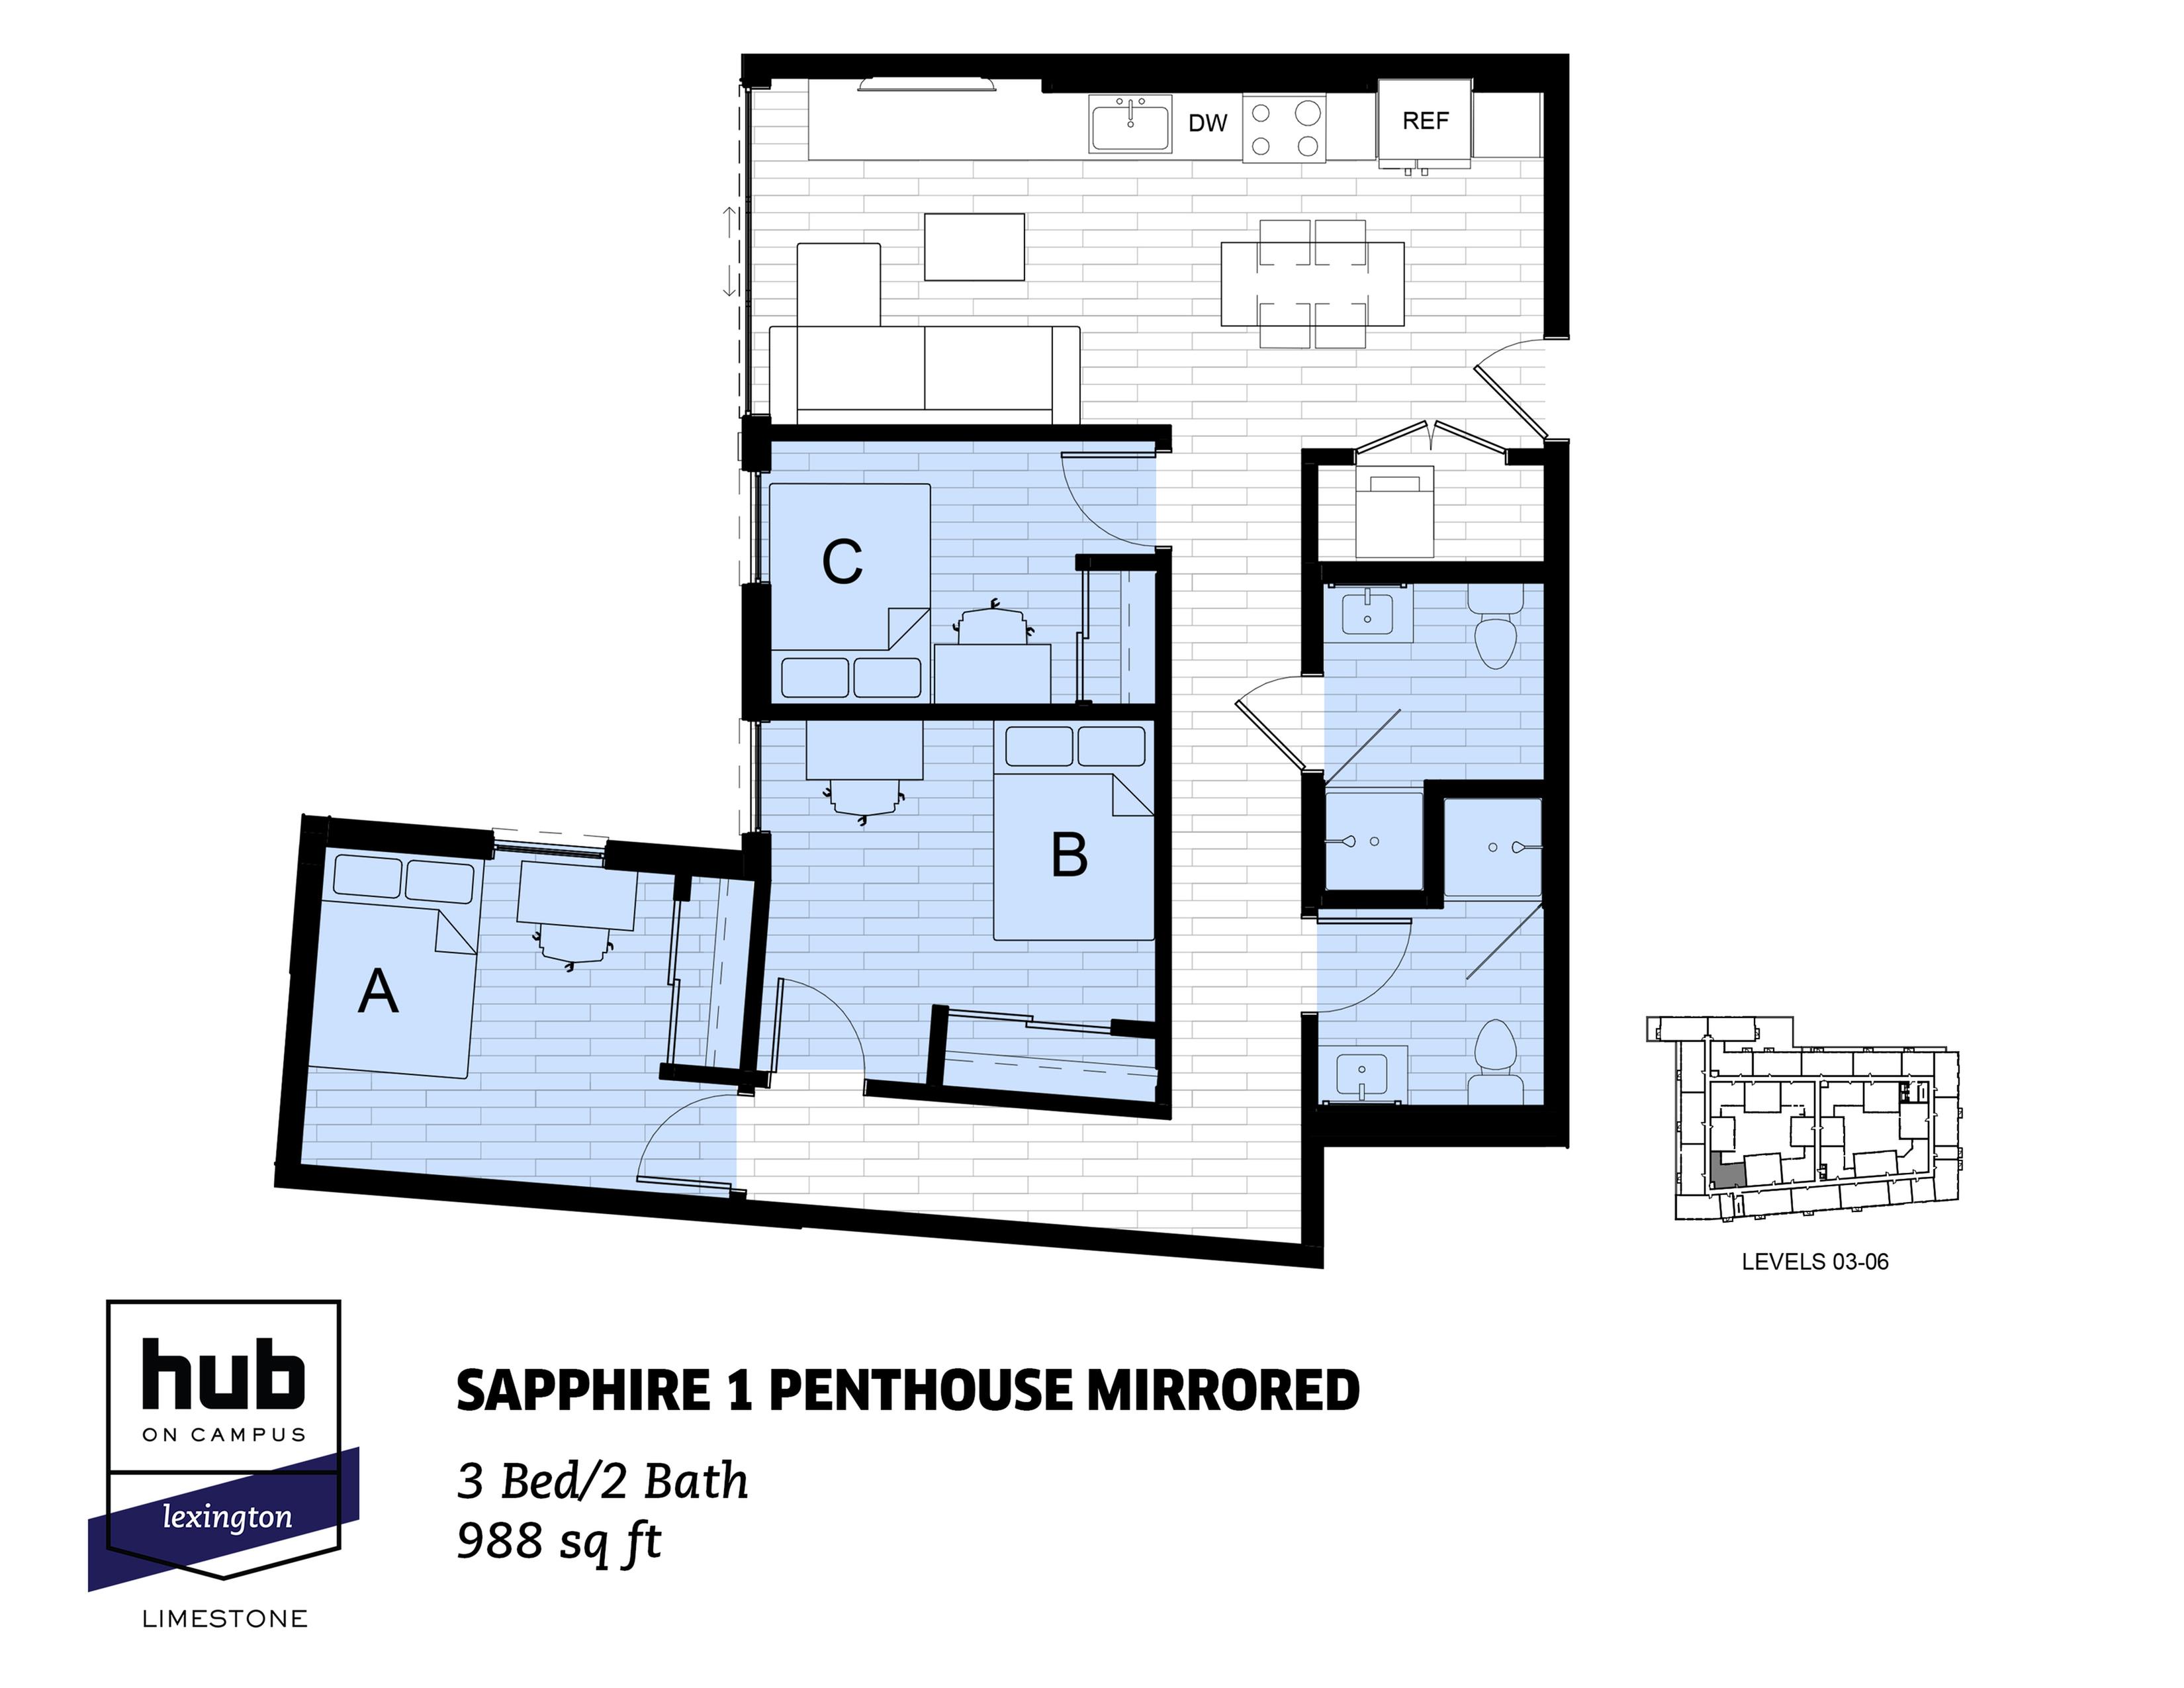 Sapphire 1 Penthouse Mirrored